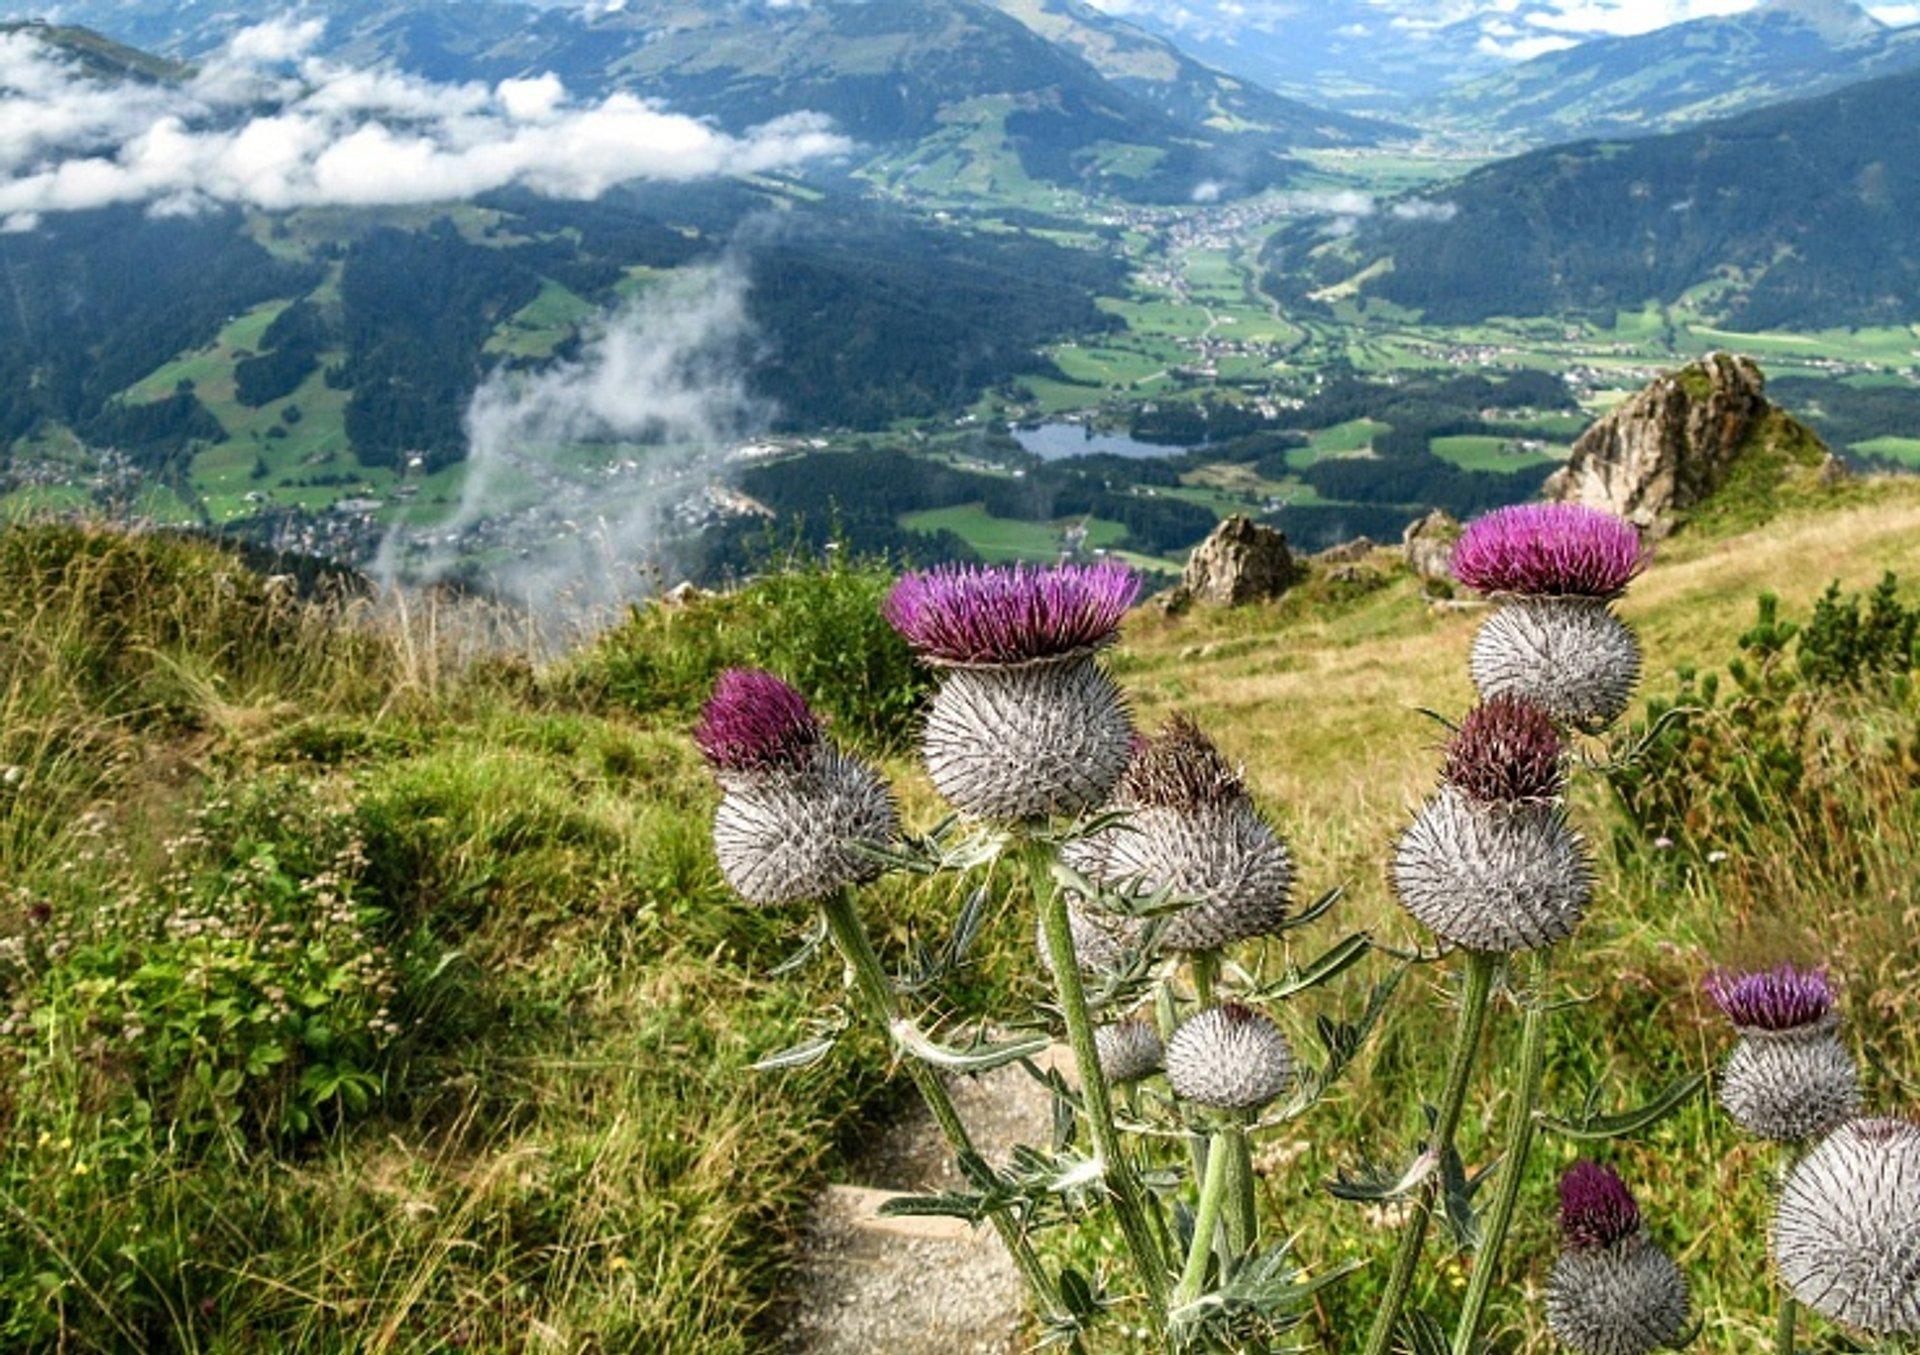 Alpine Flower Garden Kitzbüheler Horn in Austria - Best Time